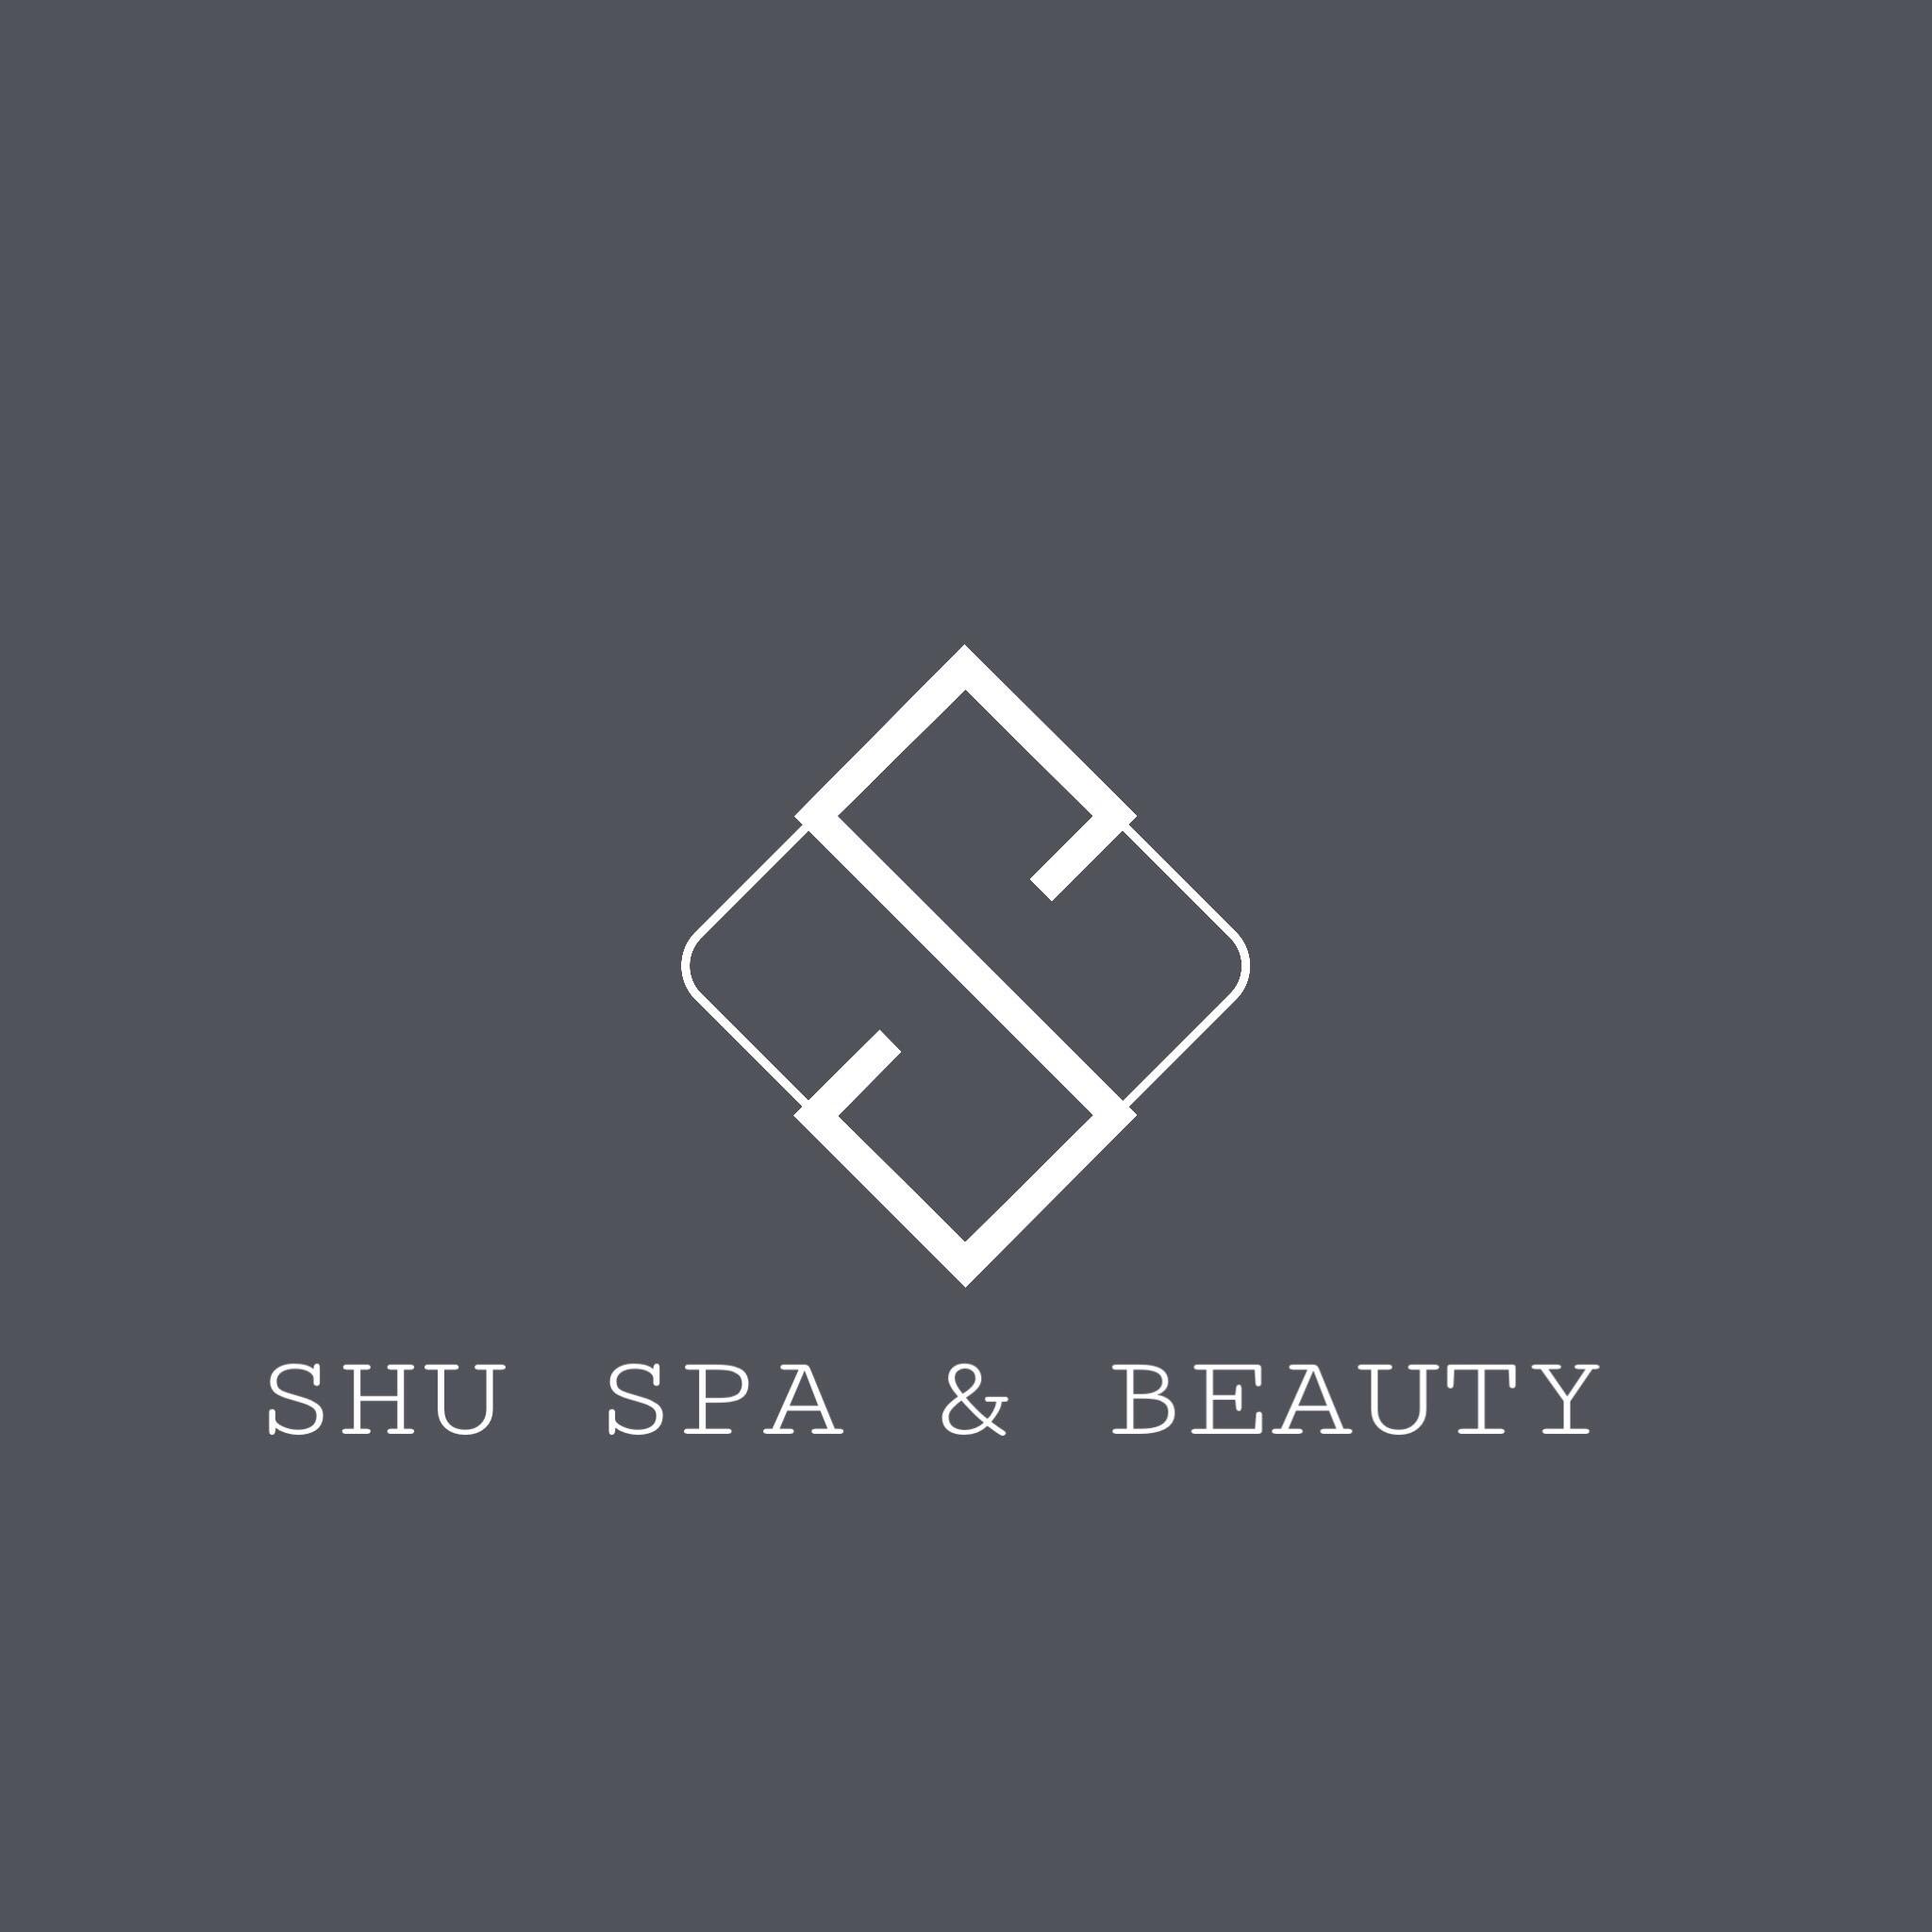 Shu Hair & Spa